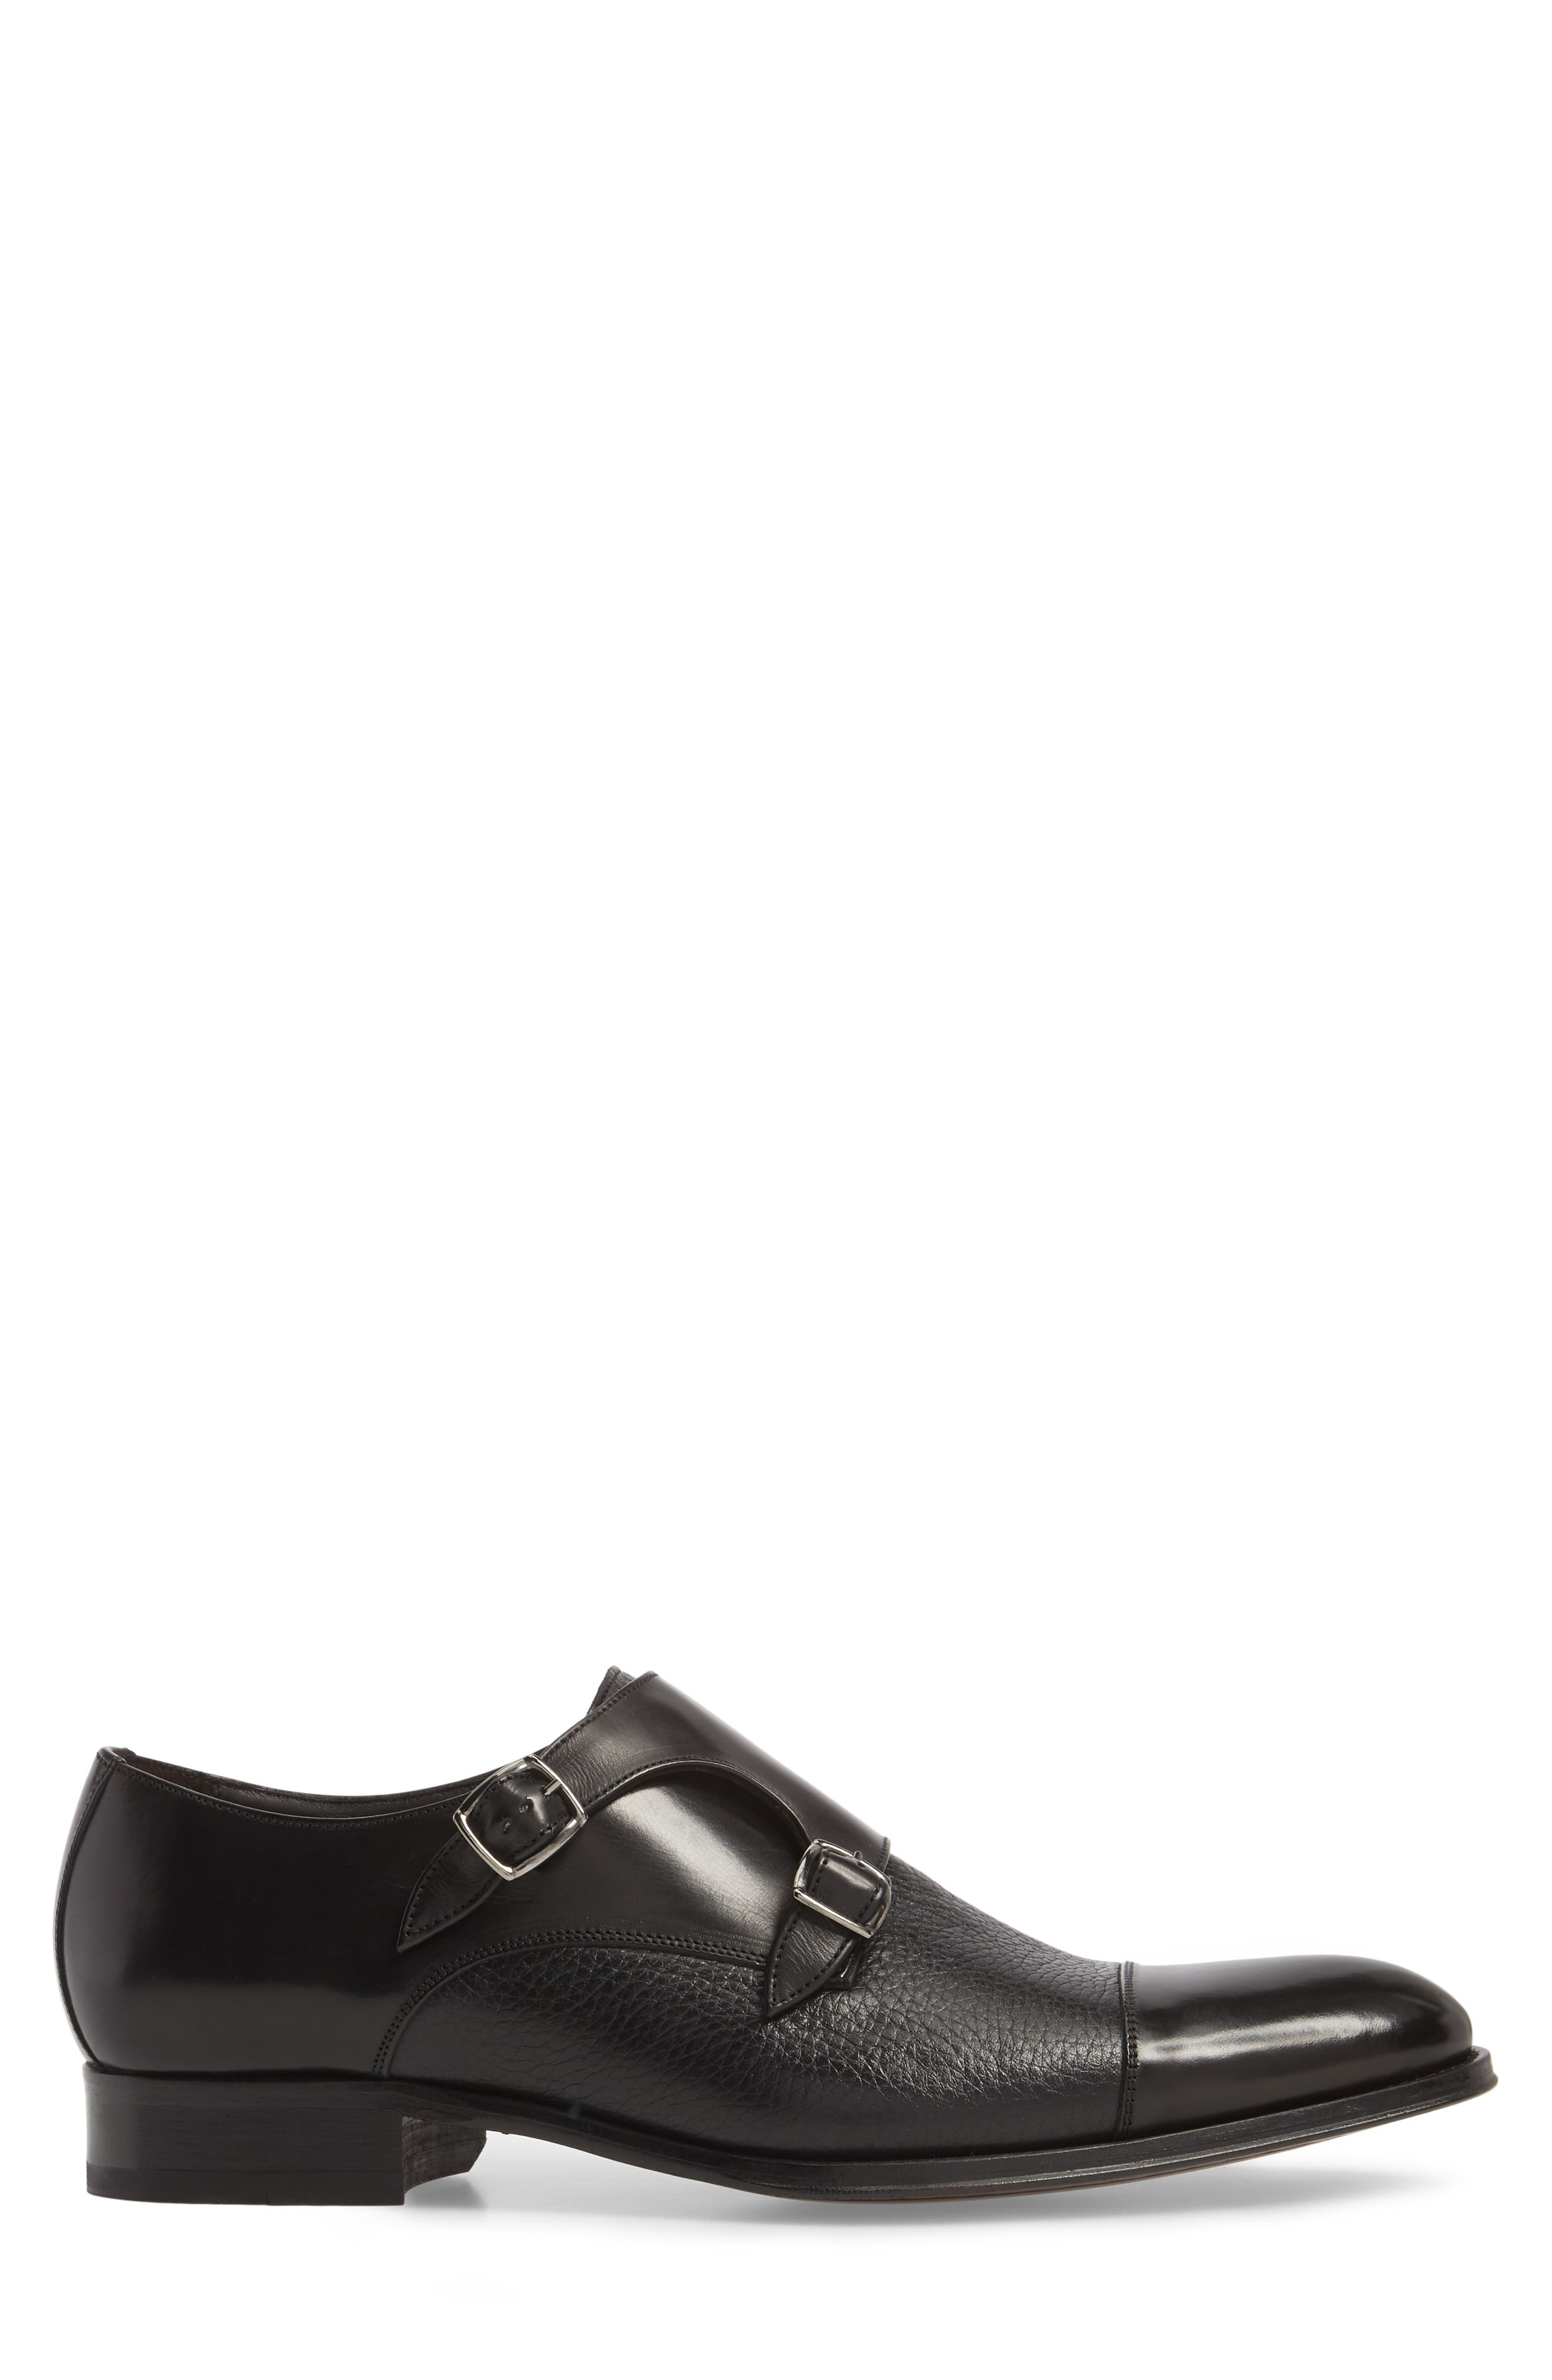 Kiev Double Monk Strap Shoe,                             Alternate thumbnail 3, color,                             BLACK/ BLACK LEATHER